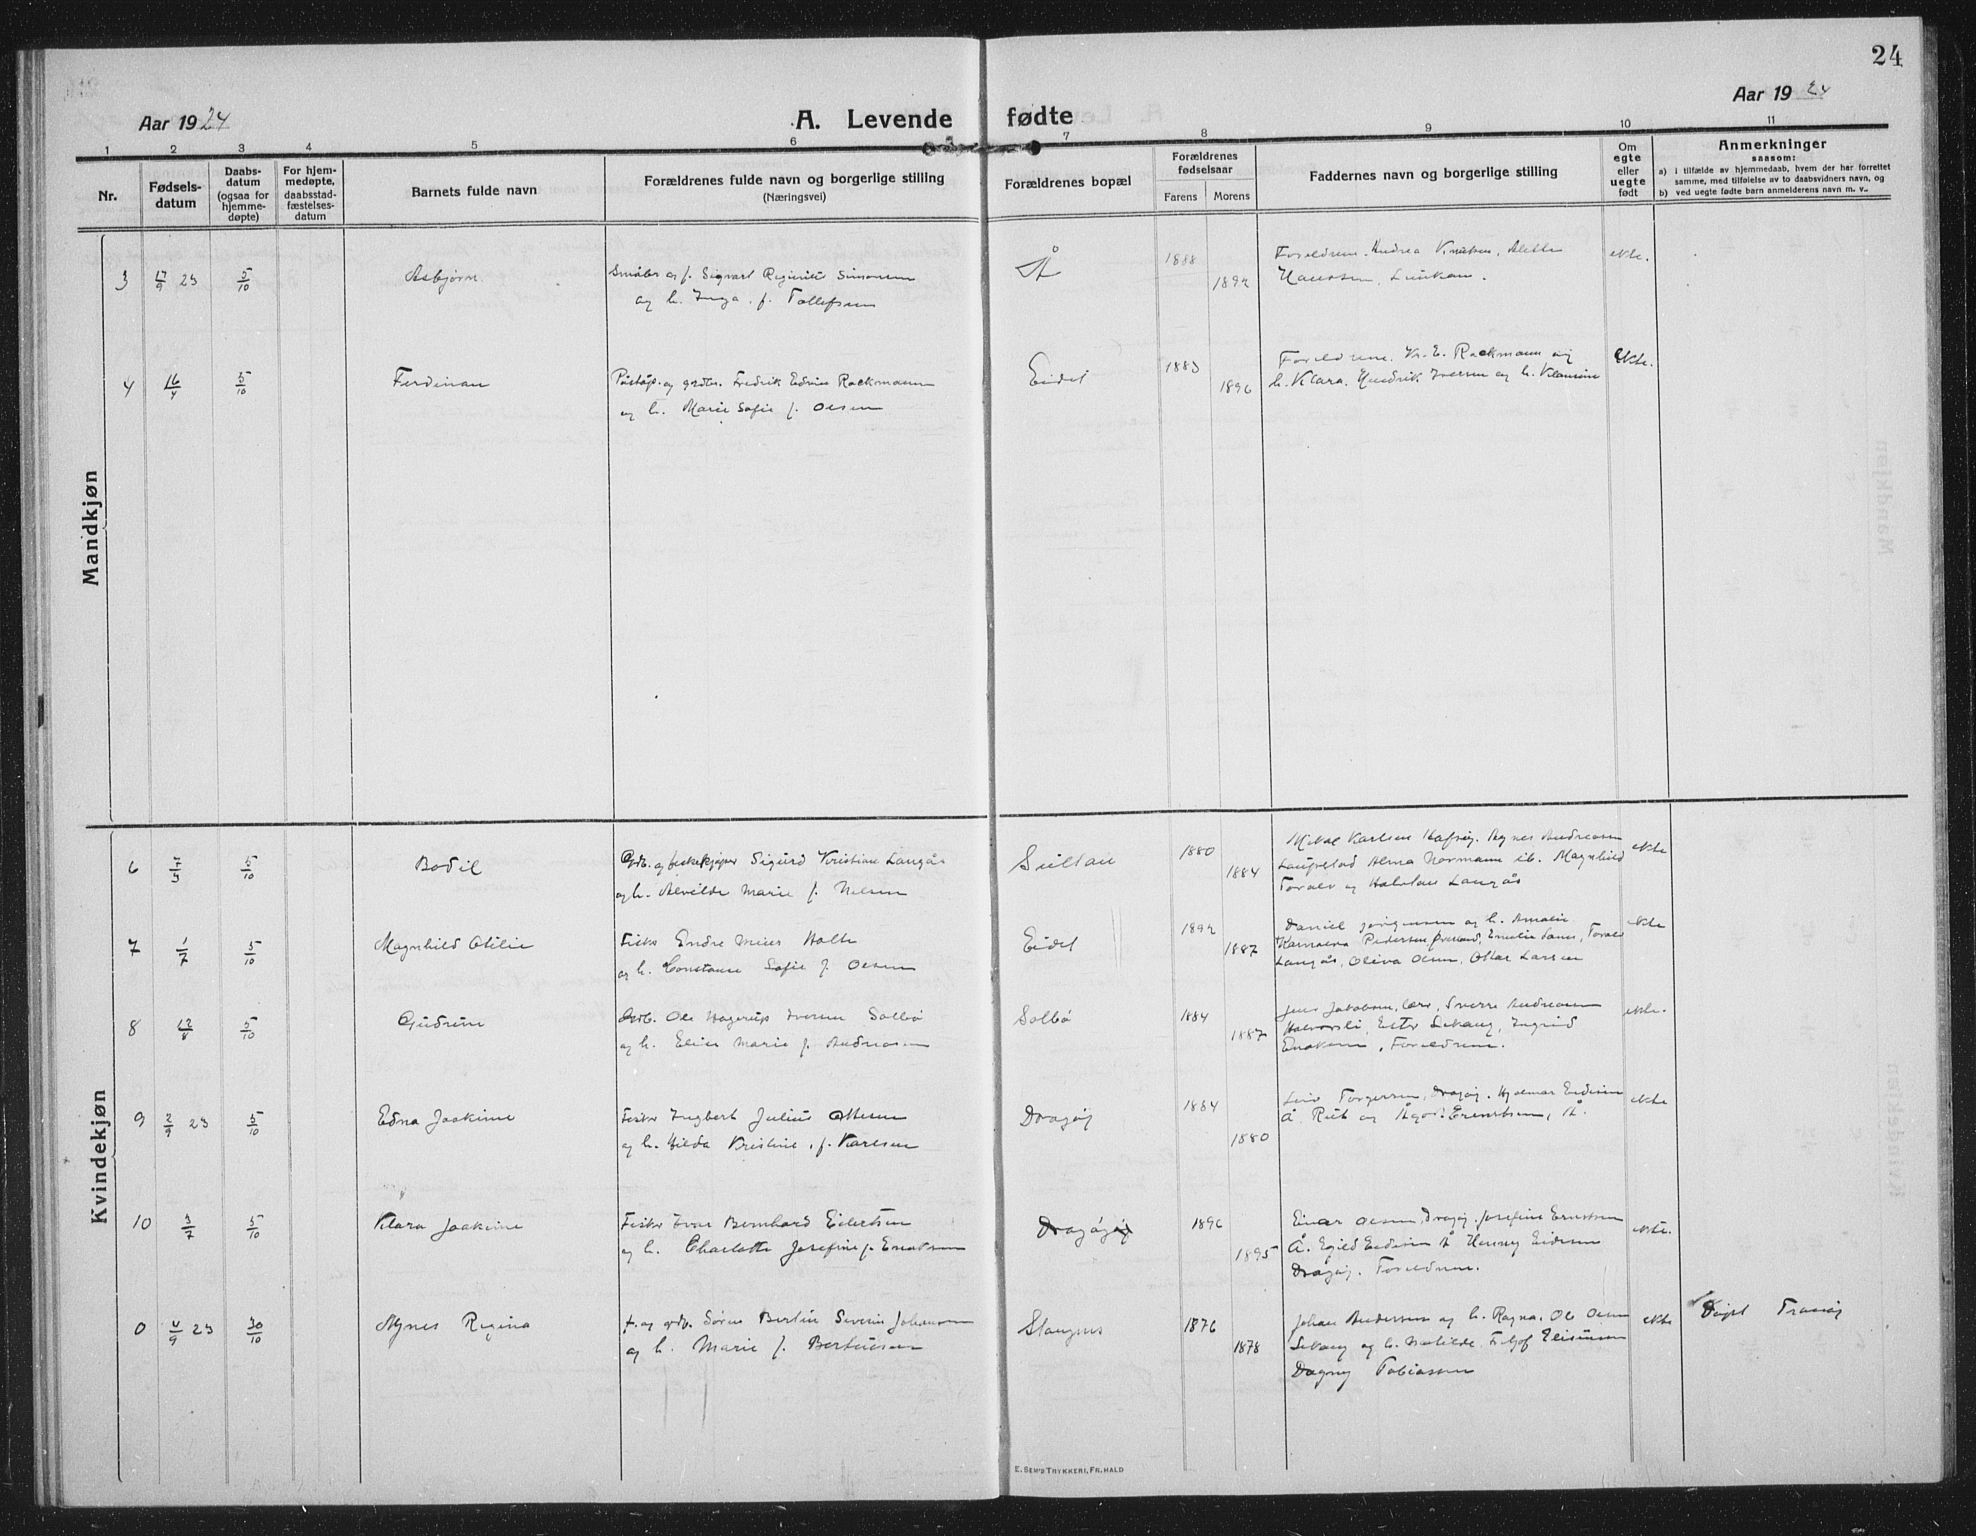 SATØ, Tranøy sokneprestkontor, I/Ia/Iab/L0019klokker: Klokkerbok nr. 19, 1914-1940, s. 24